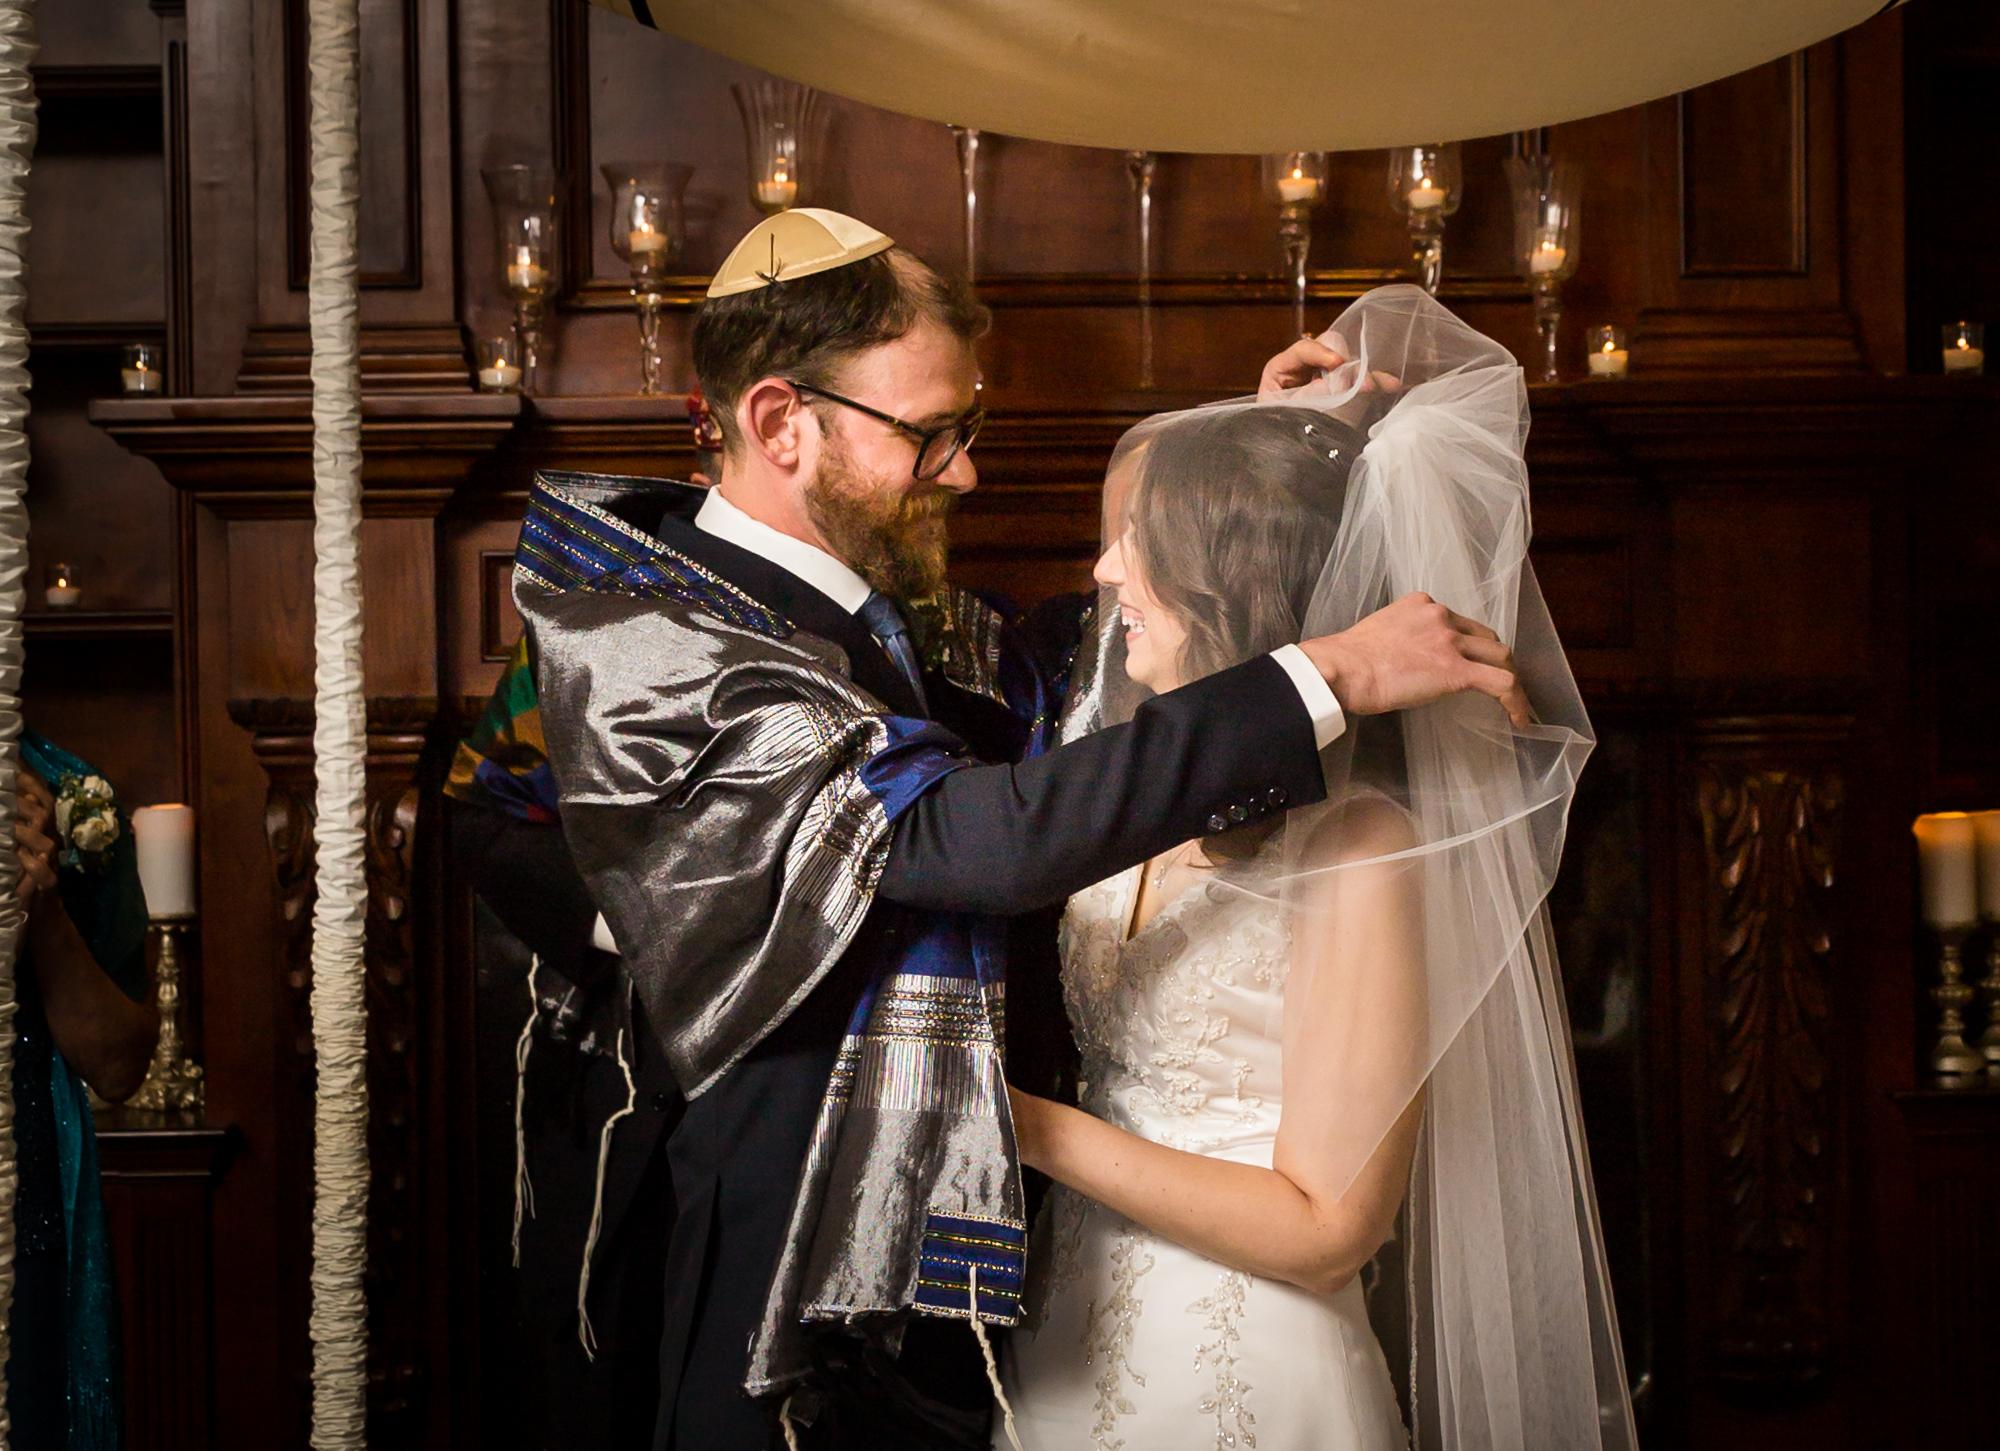 Groom lifting bride's veil for an article on band vs DJ